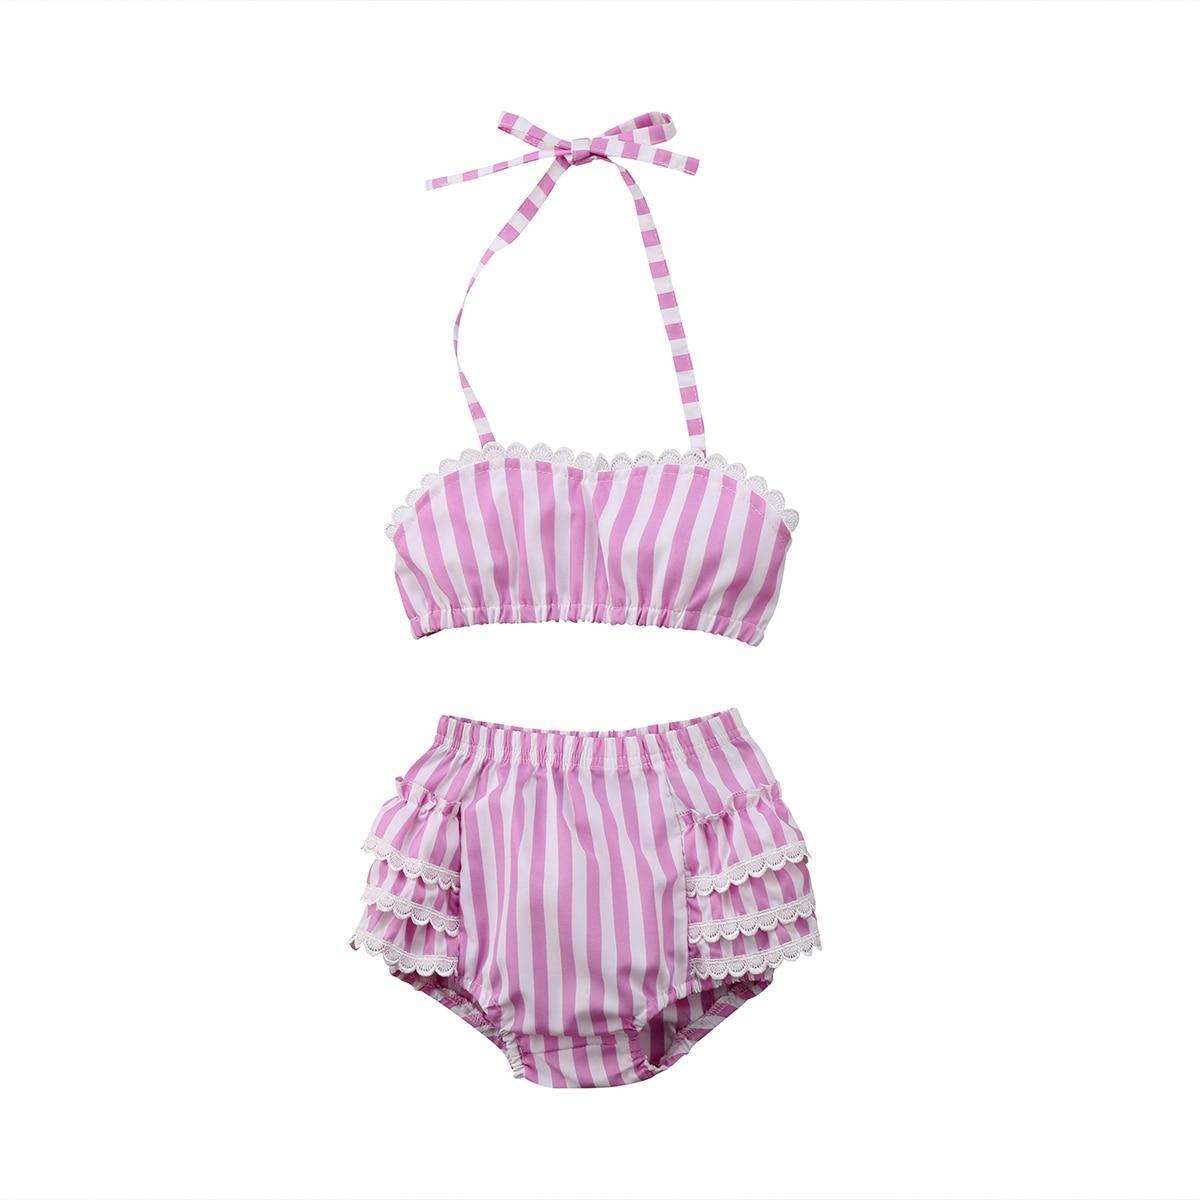 3289d03b678068 Peuter Kids Baby Meisjes Bikini Set Roze Gestreepte Ruches Badmode Badpak  Badpak Beachwear in Peuter Kids Baby Meisjes Bikini Set Roze Gestreepte  Ruches ...